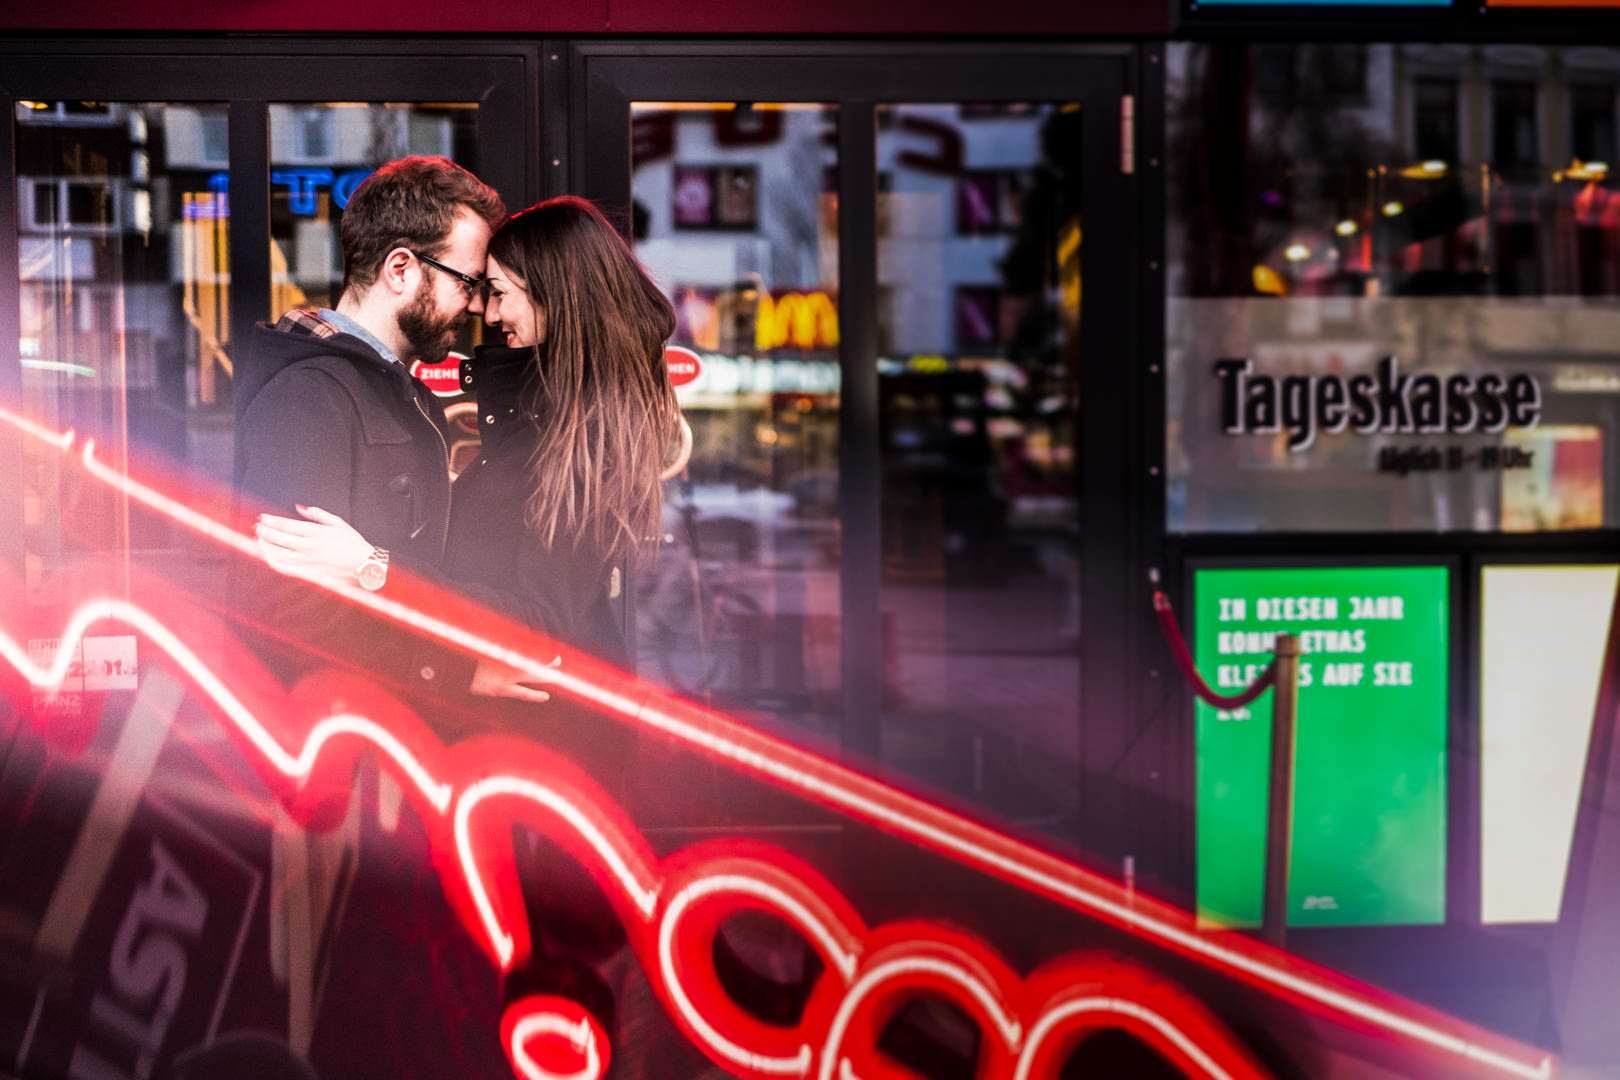 Preboda-Hamburgo-Maria-Carles-engagement-Rafael-Torres-fotografo-bodas-sevilla-madrid-barcelona-wedding-photographer--1.jpg